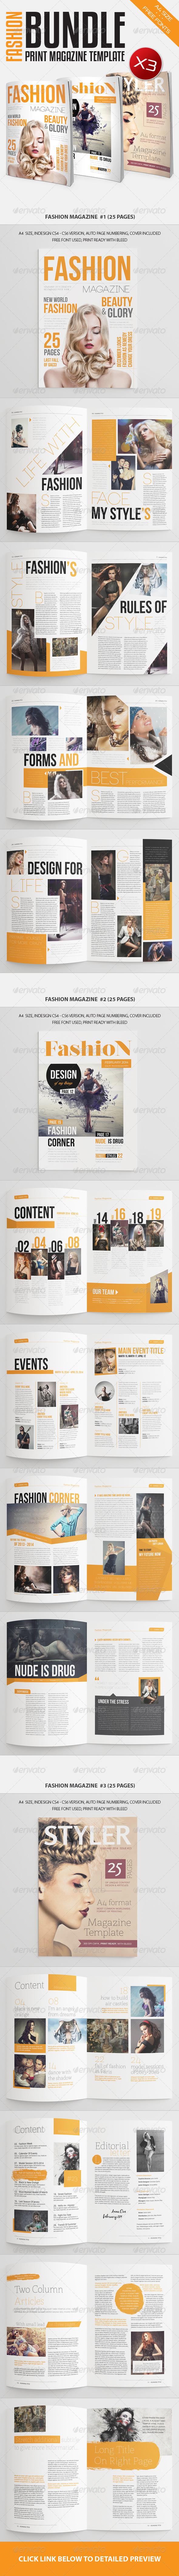 Fashion Magazine Bundle Vol1 - Magazines Print Templates